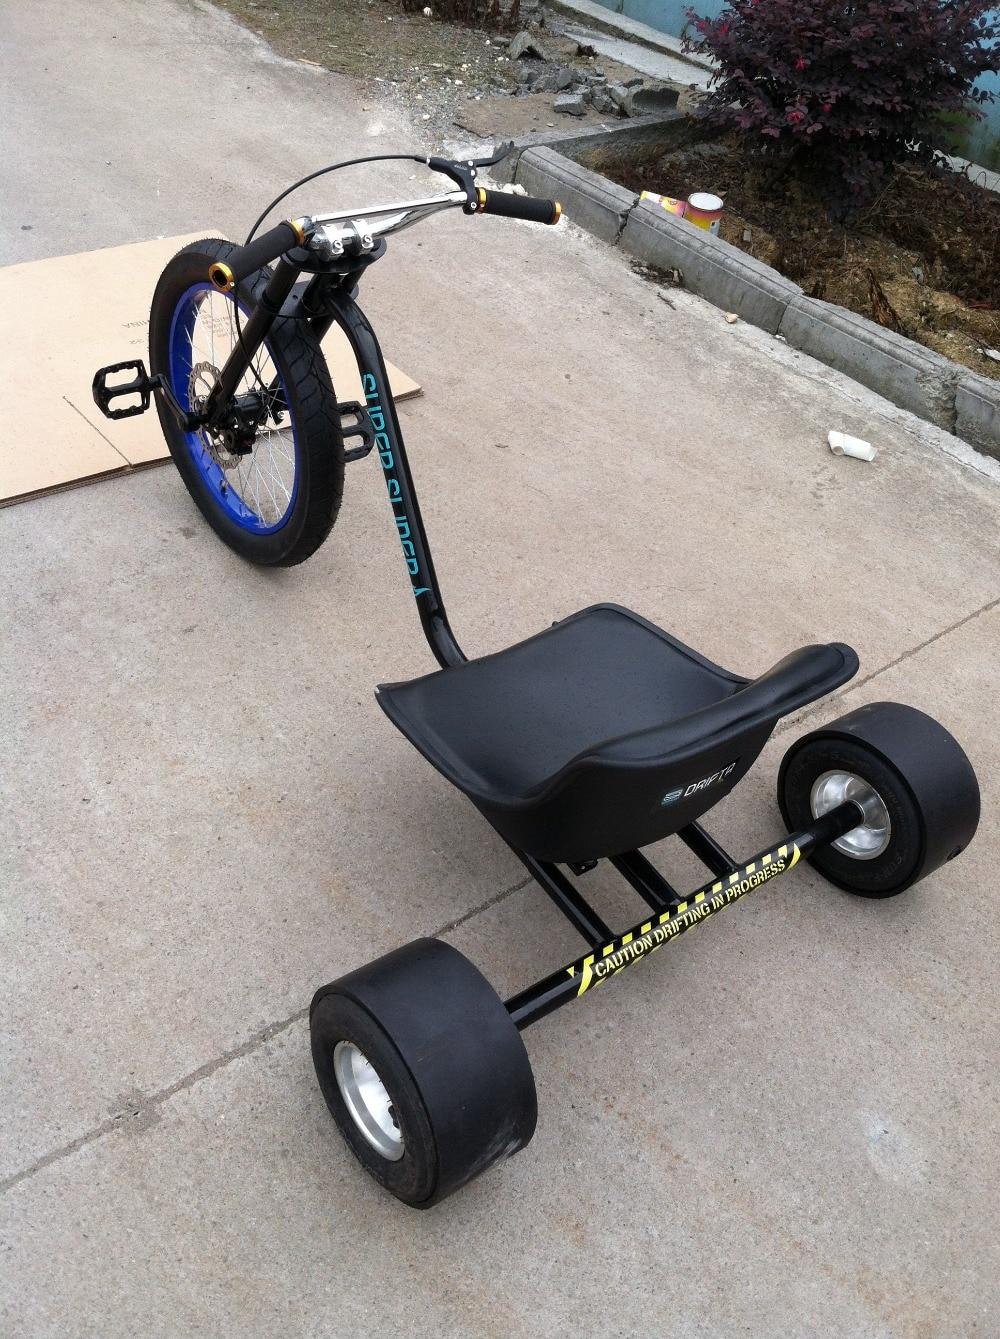 H Fat Drift Trike Rb Fhd16 Pedal Freewheel Drift Trike For Adult